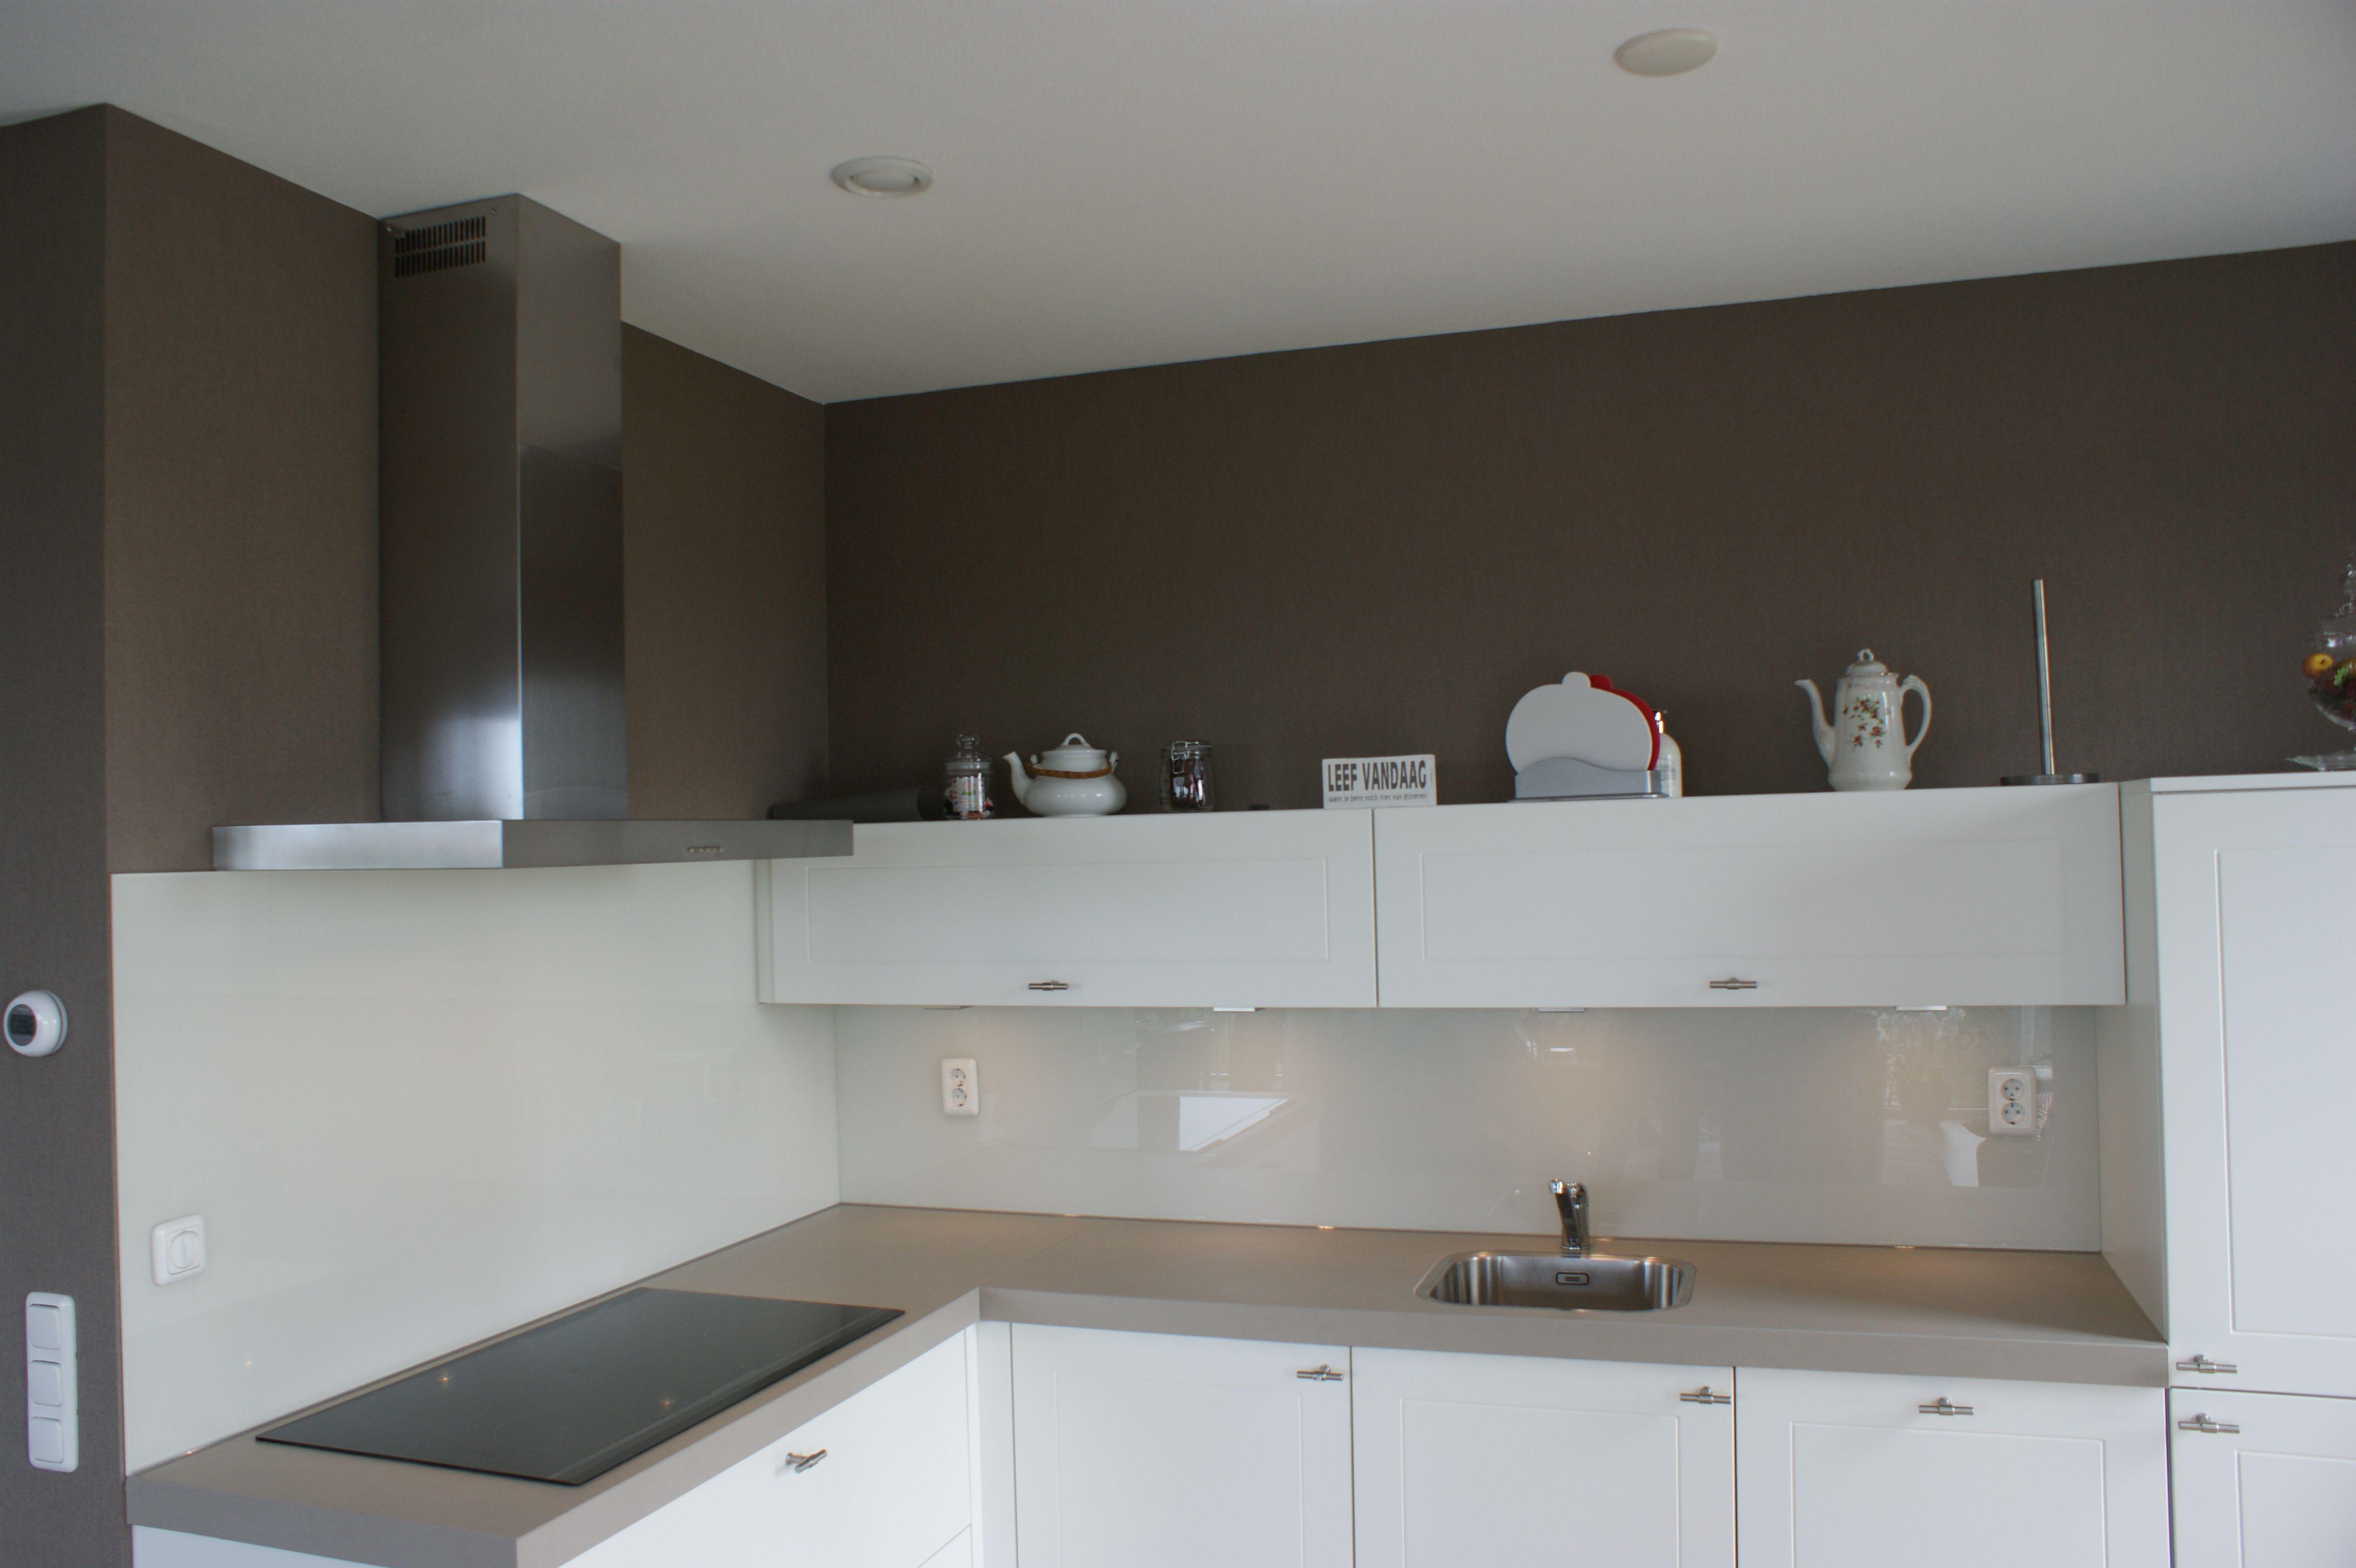 Achterwand Keuken Taupe : Zacht witte glazen achterwand op een taupe muur Варианты